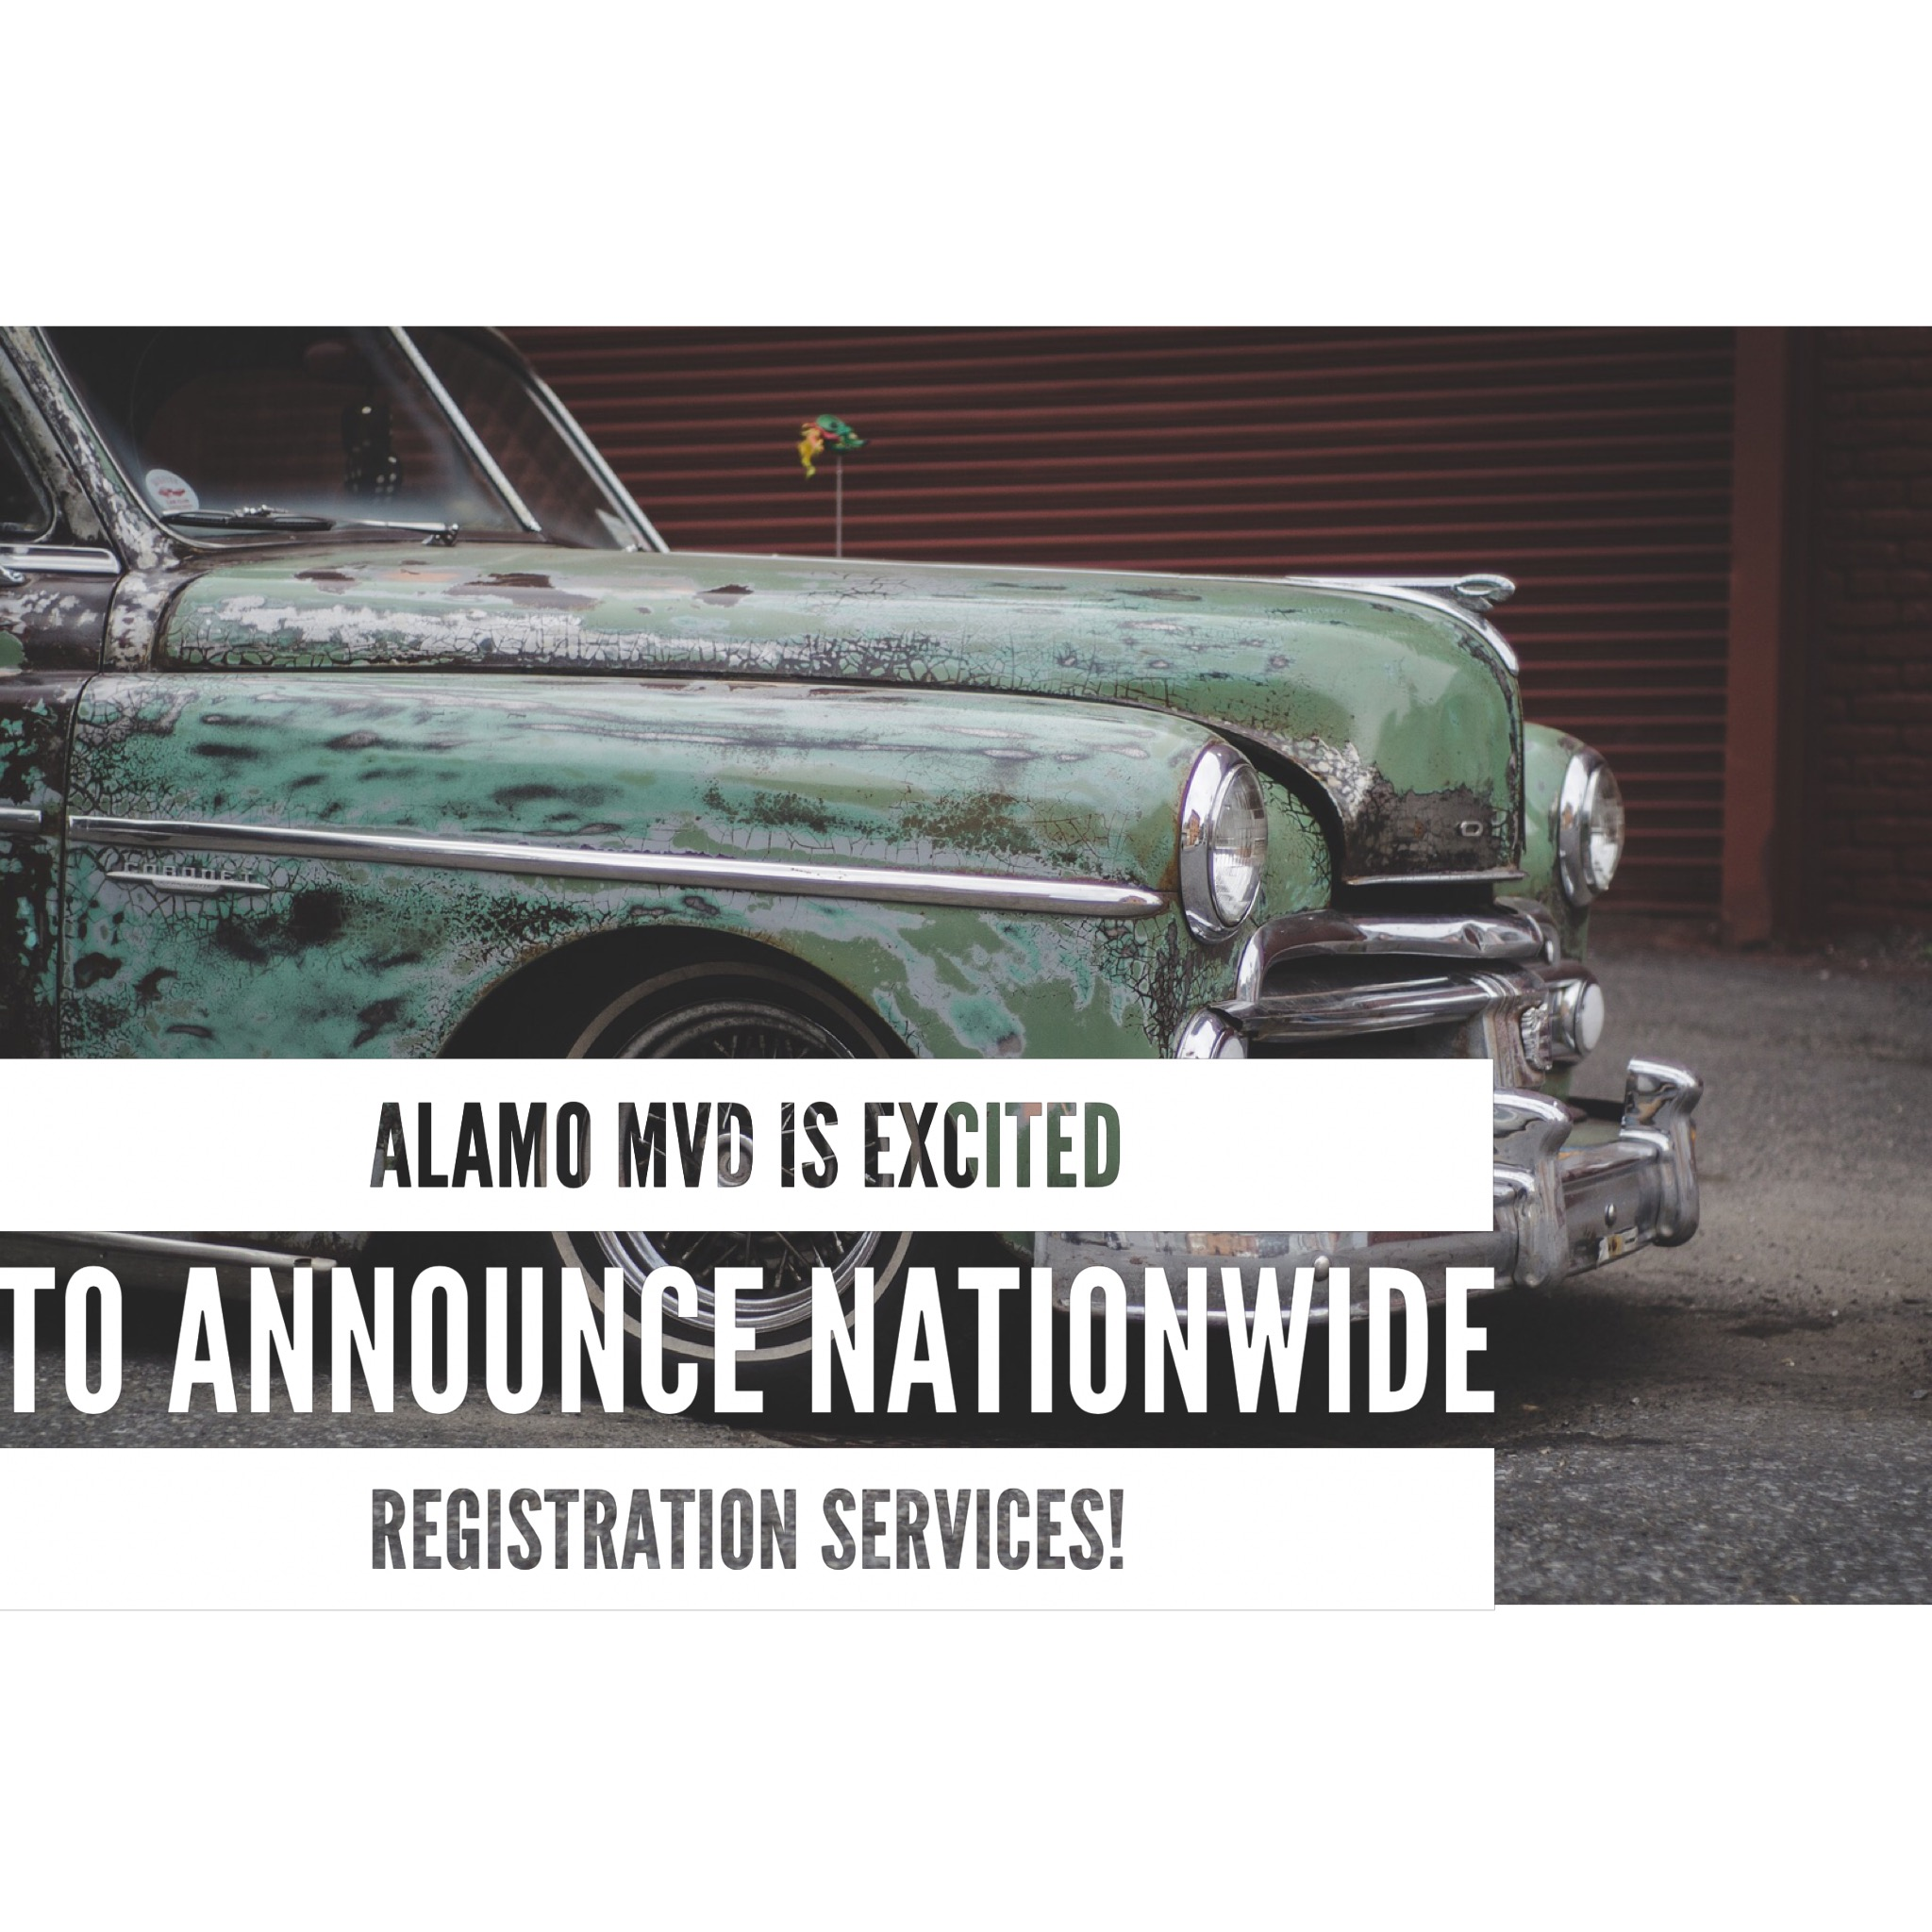 nationwide registeration services alamomvd.jpg